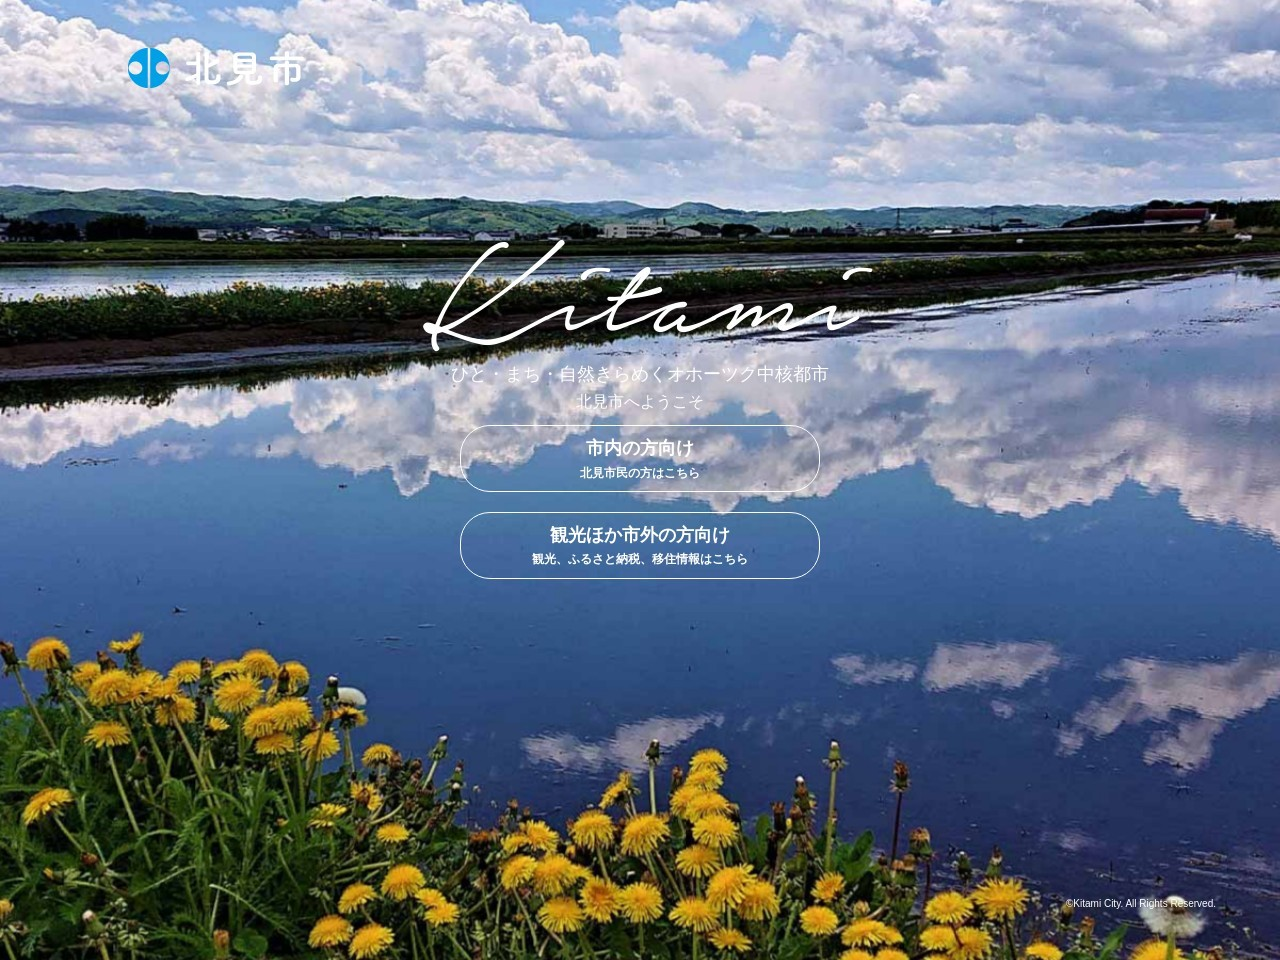 http://www.city.kitami.lg.jp/docs/2017021300048/